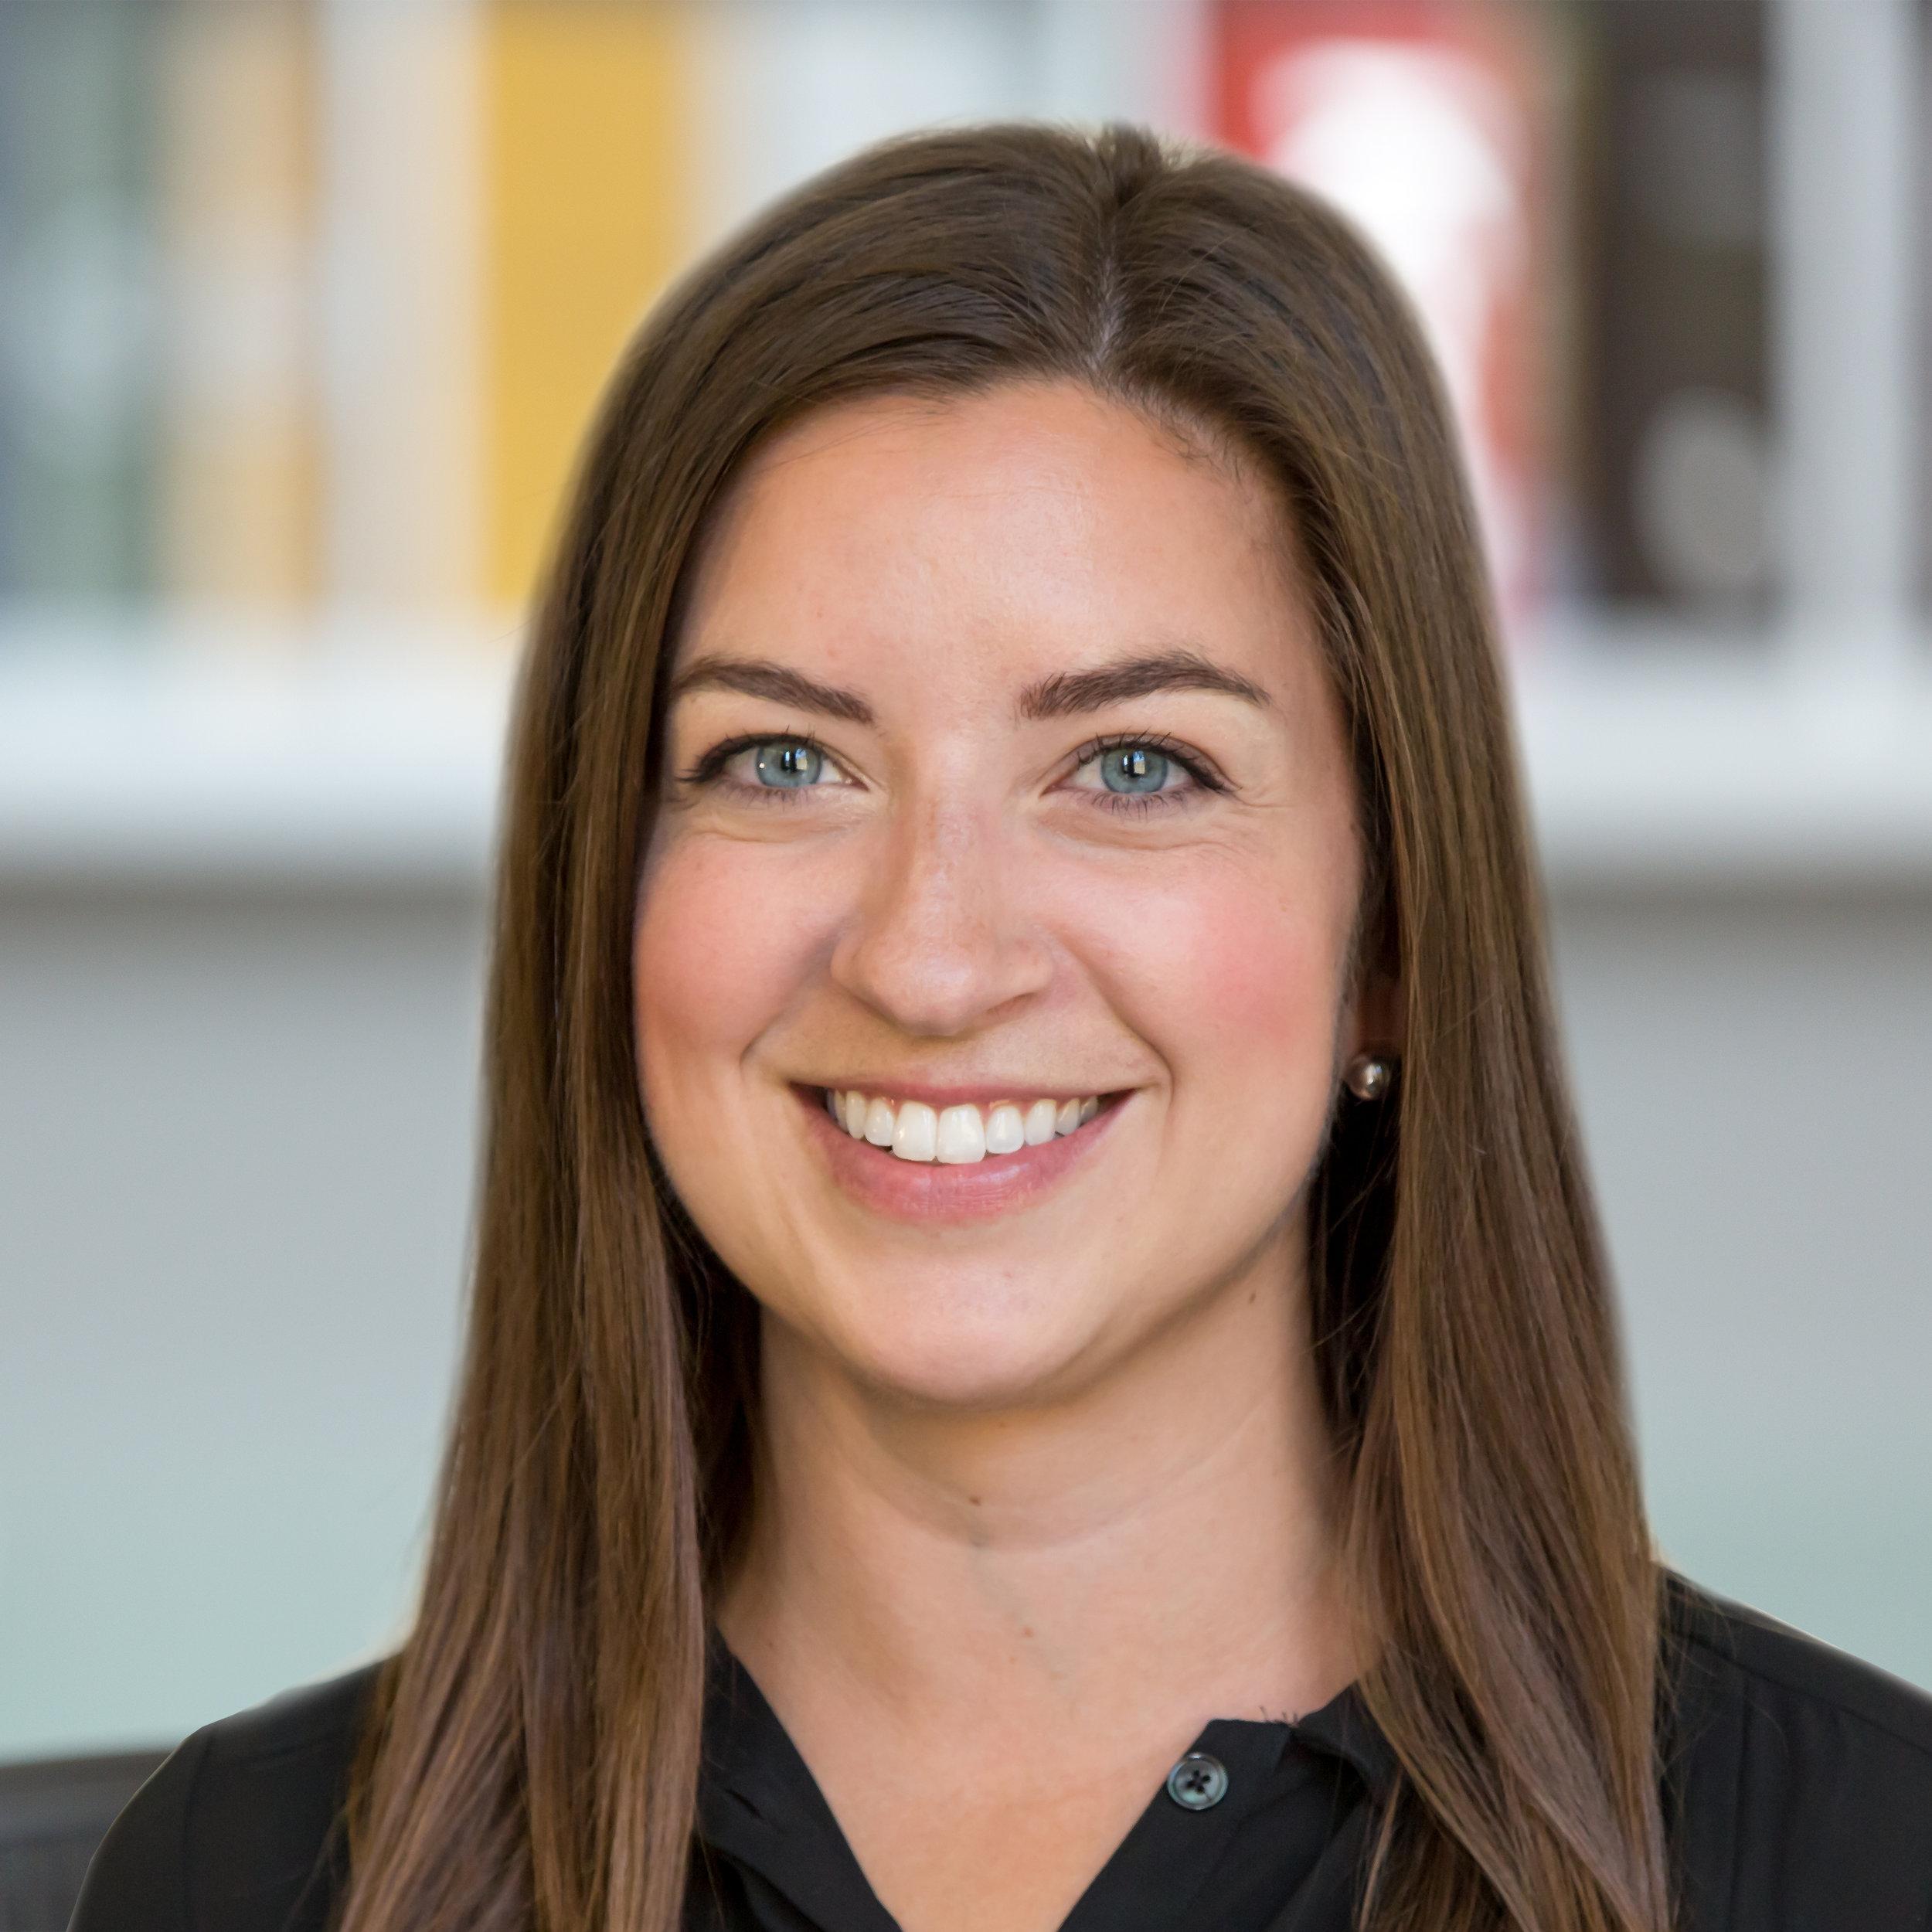 Jennifer Vachon, AIA Associate